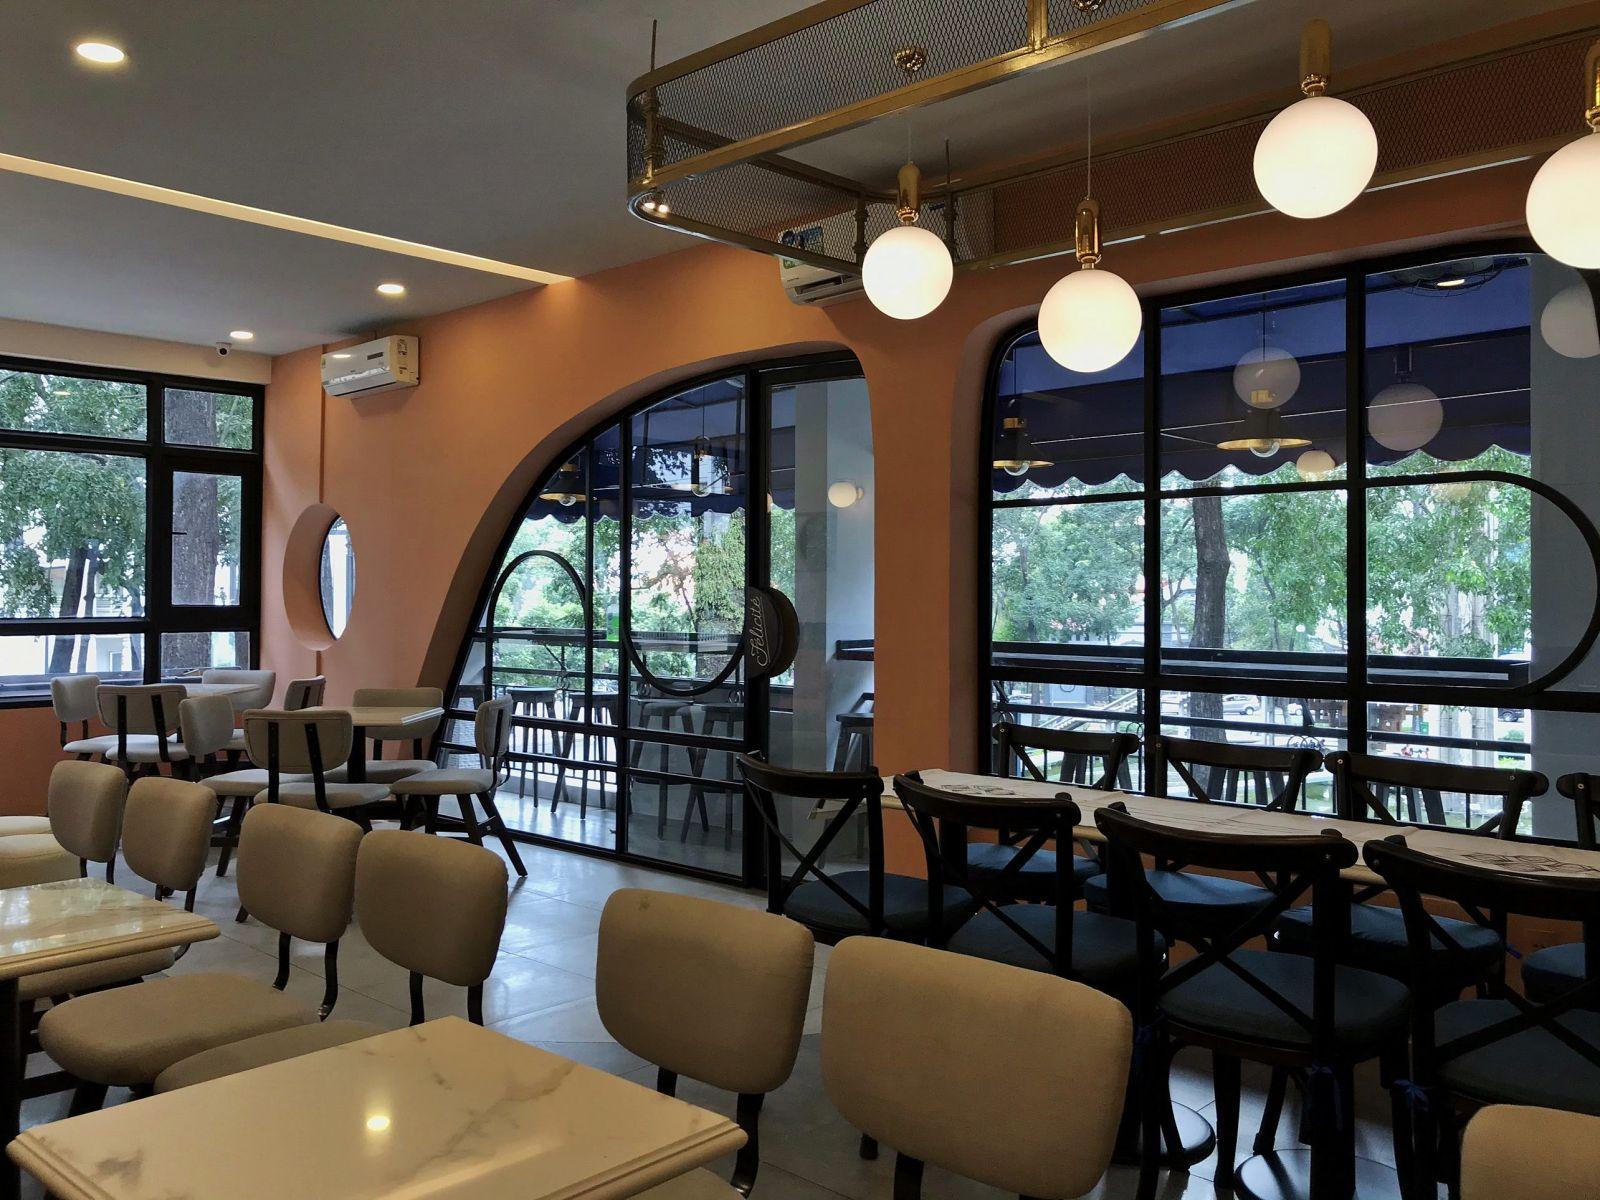 noi-that-Felicite-Coffee&Eatery-42-Tran-Cao-Van-Q3-26